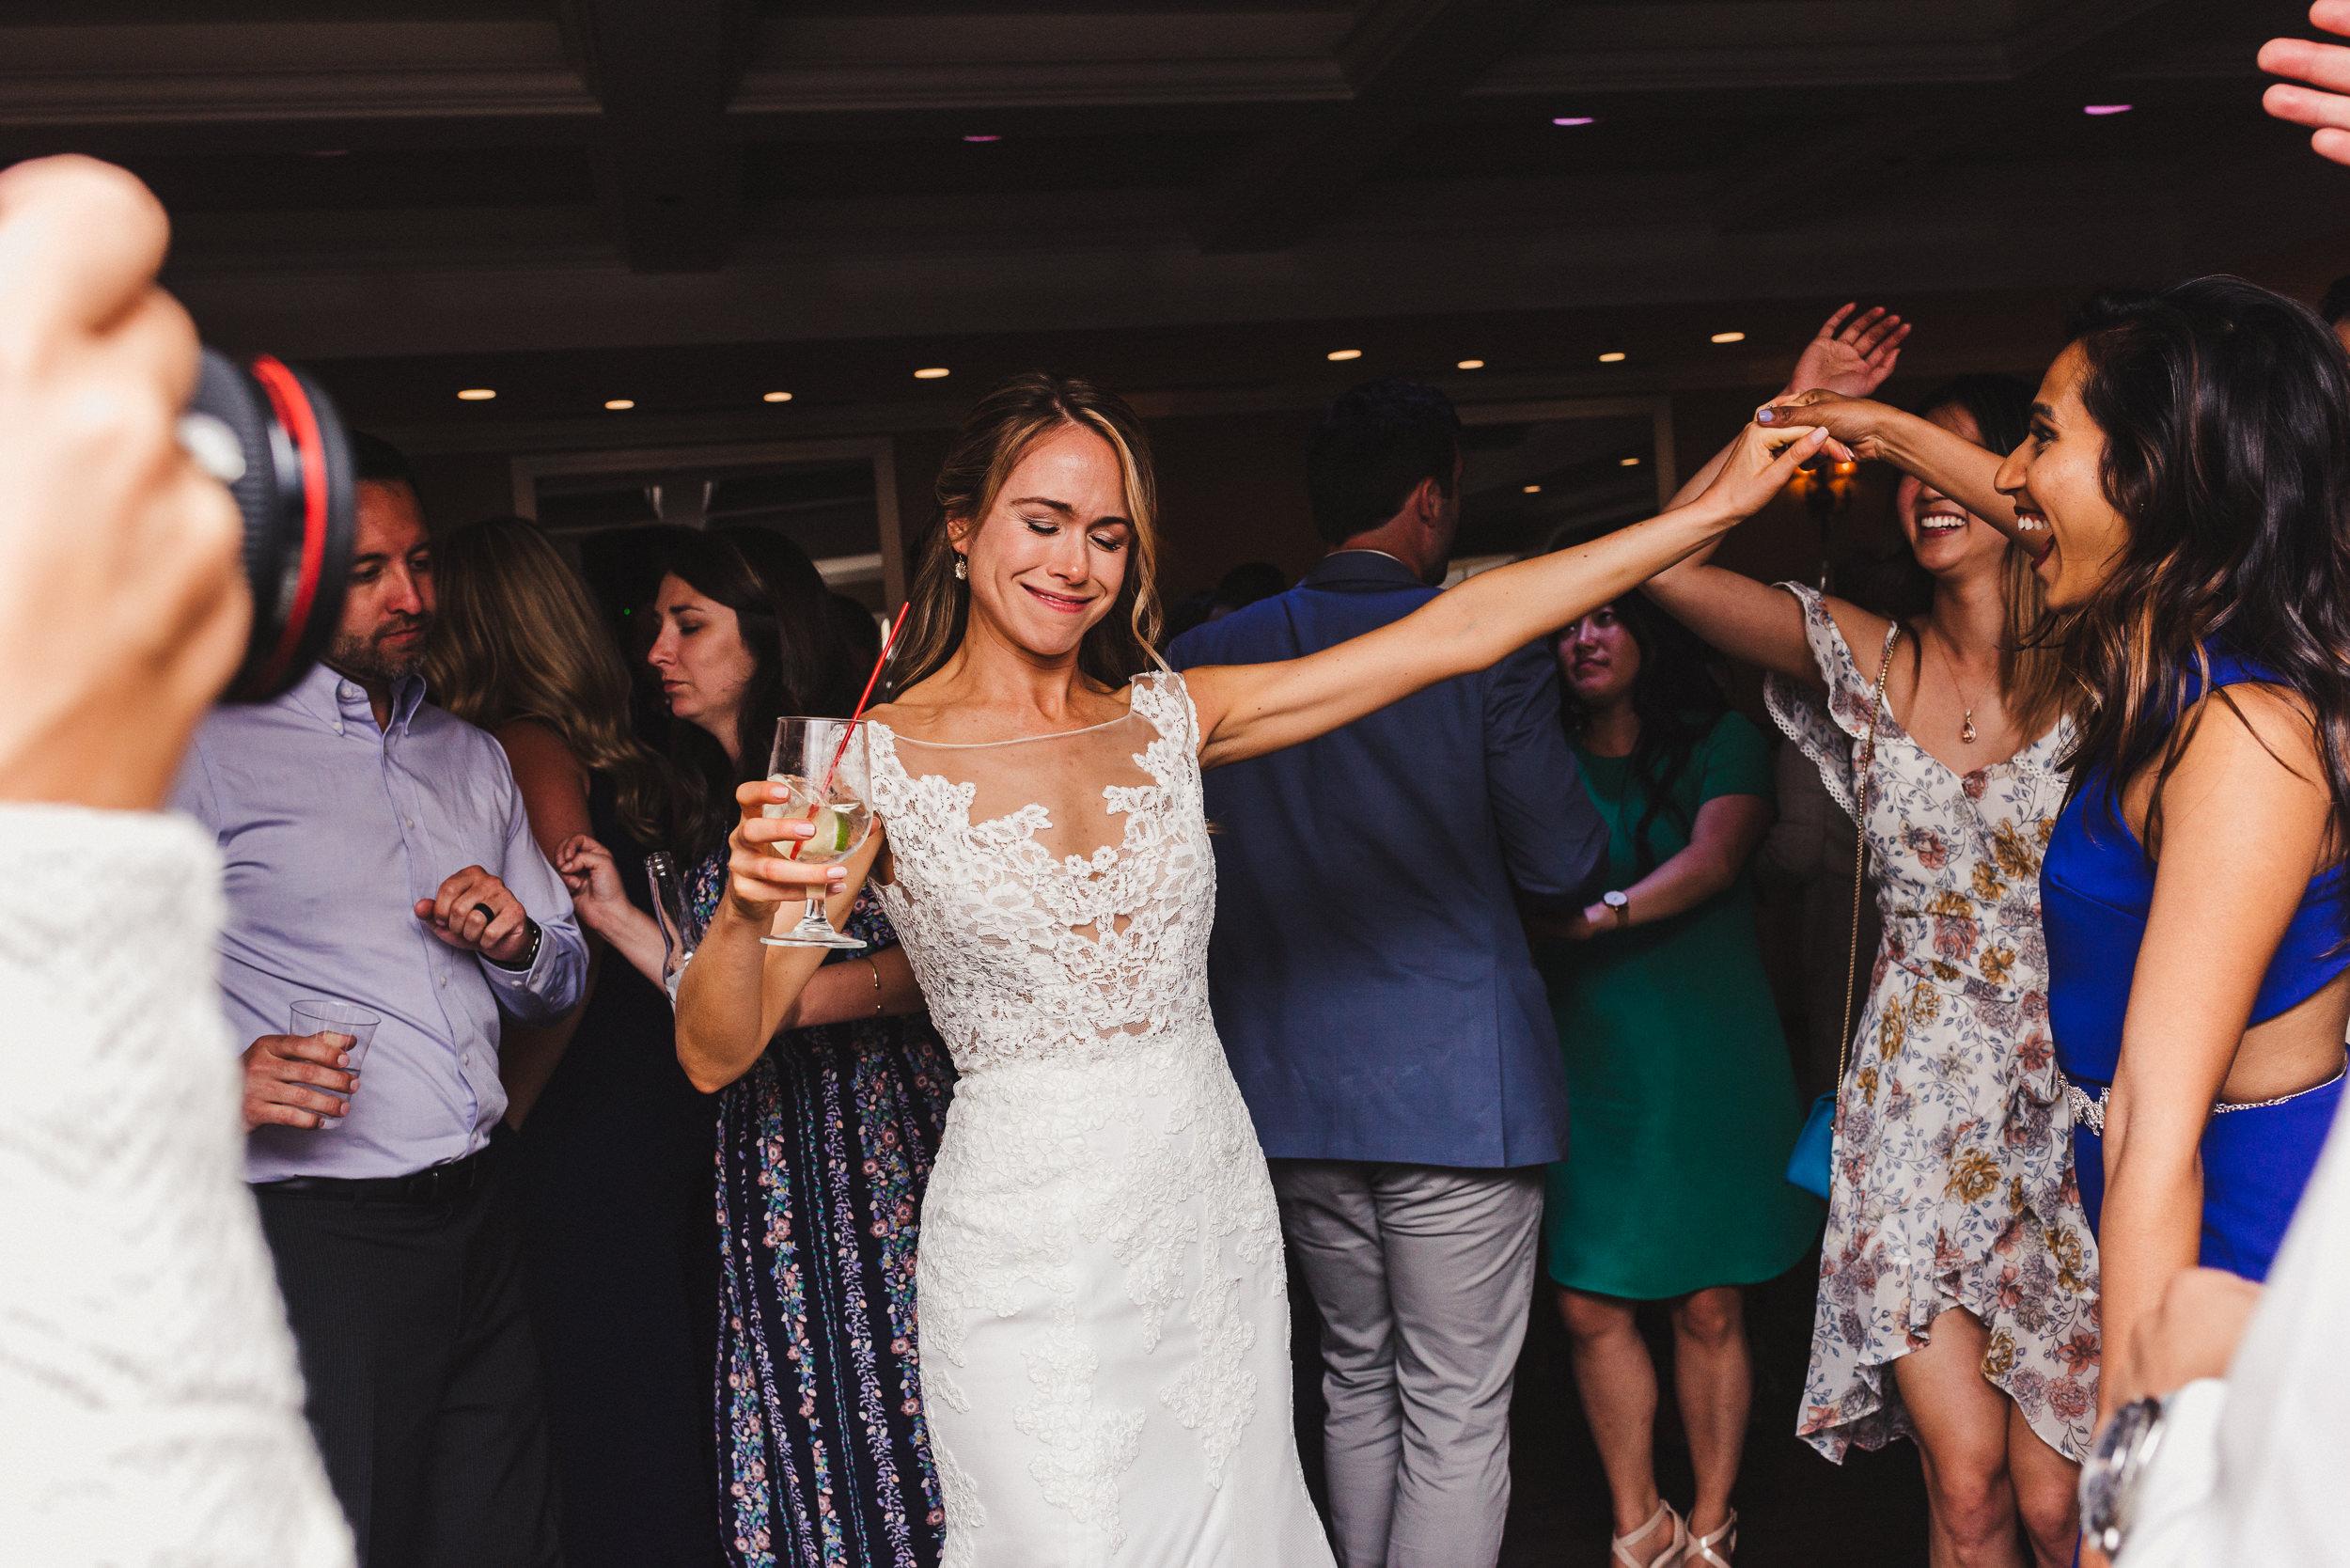 sL + E - Verandas Manhattan Beach - 12 Reception, Dancing-44.jpg